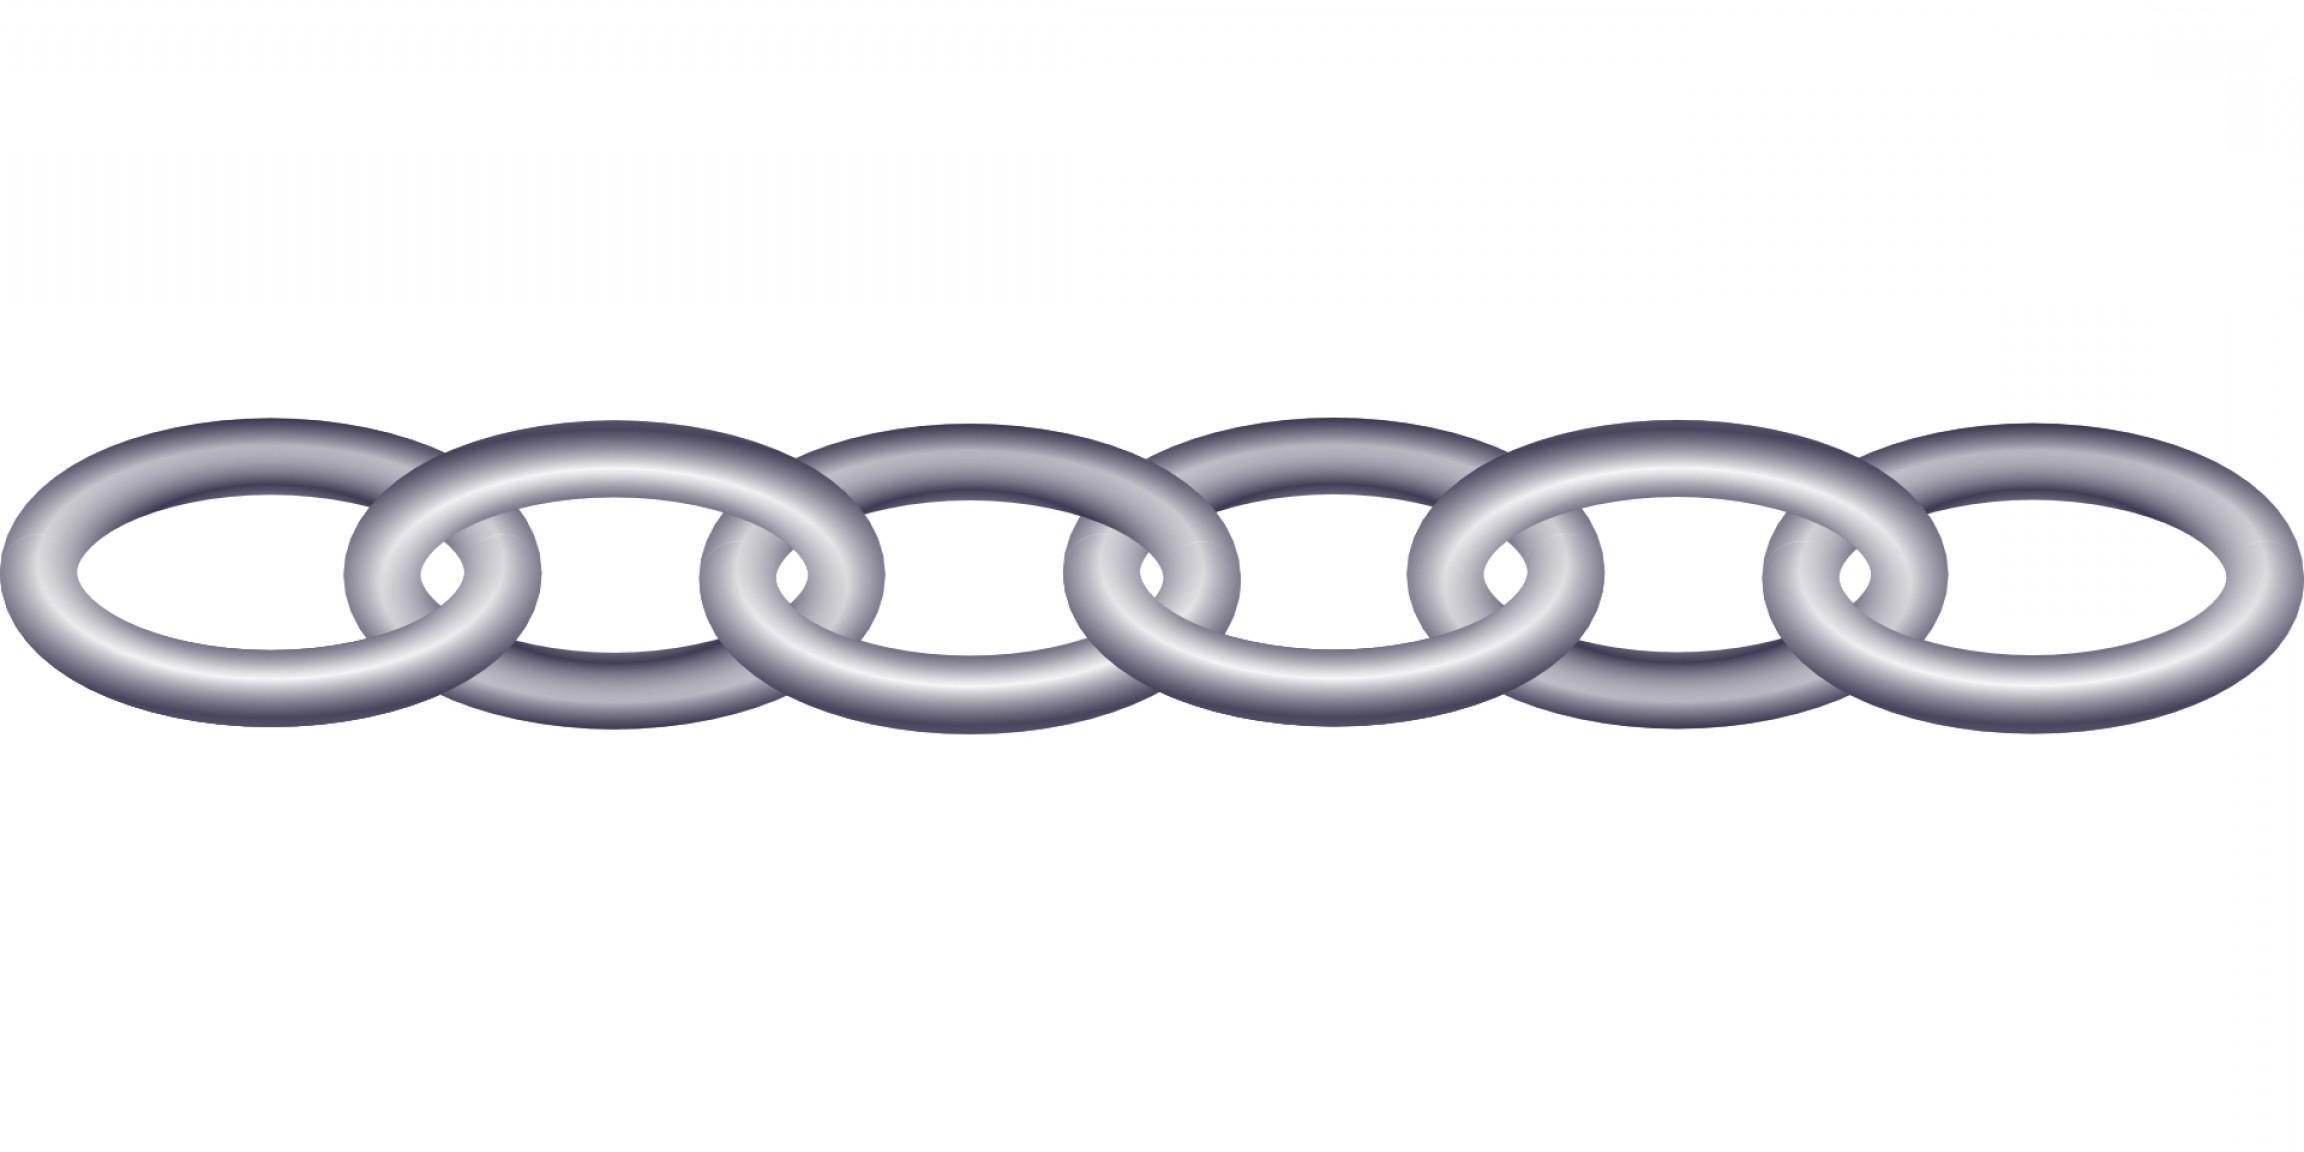 Top Motorcycle Chain Border Clip Art Design.